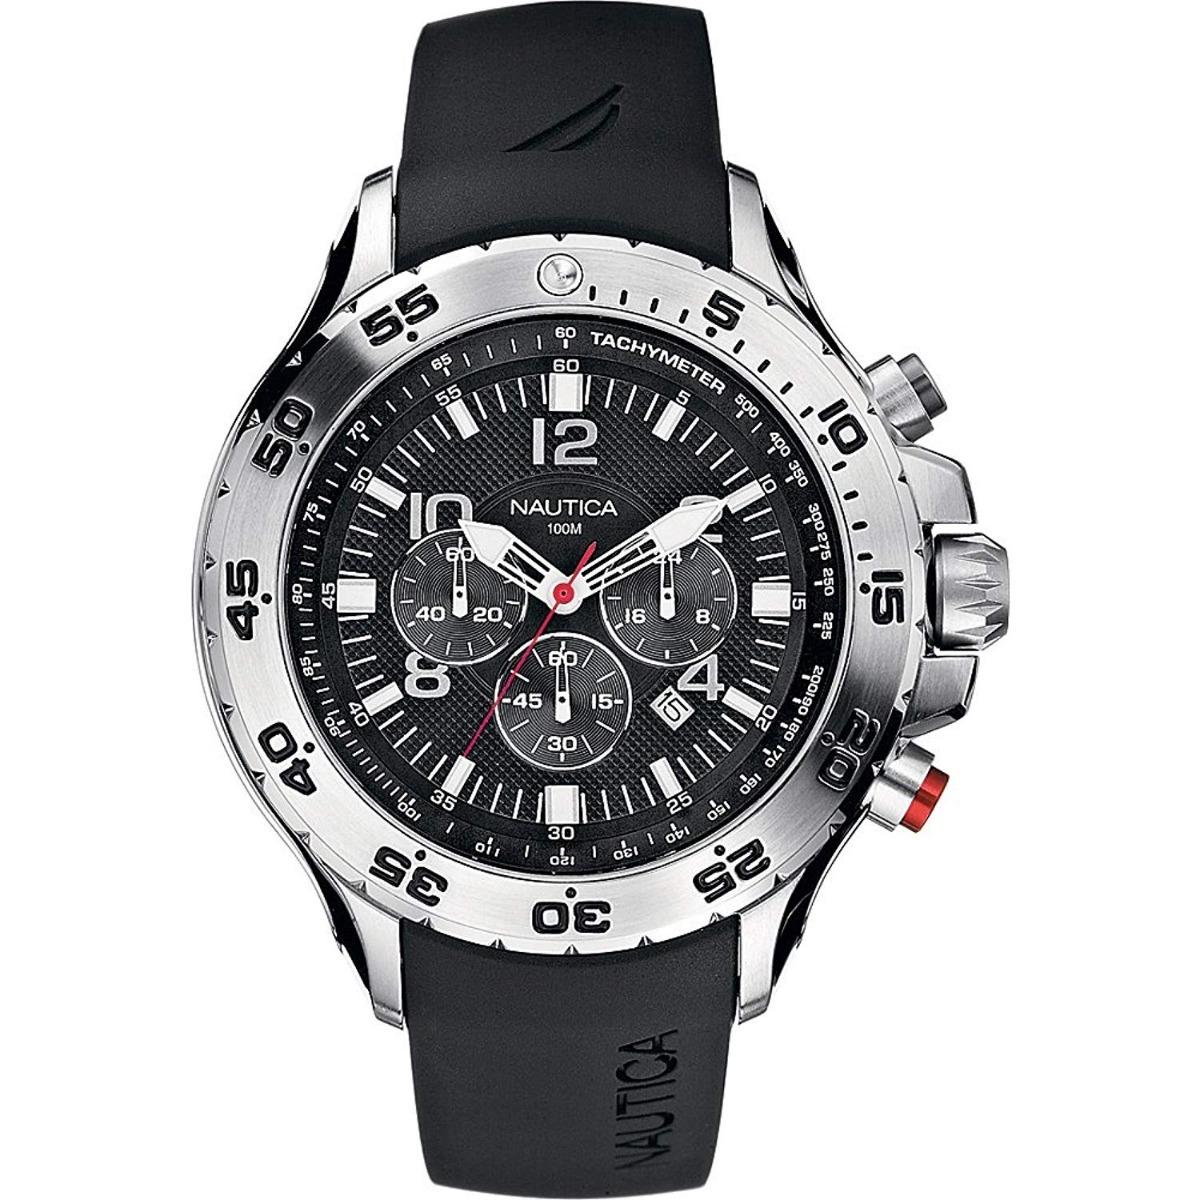 d65ea8f8a68e Reloj Nautica Hombre N14536 Nst Esfera Acero Entrega Ya -   580.000 ...